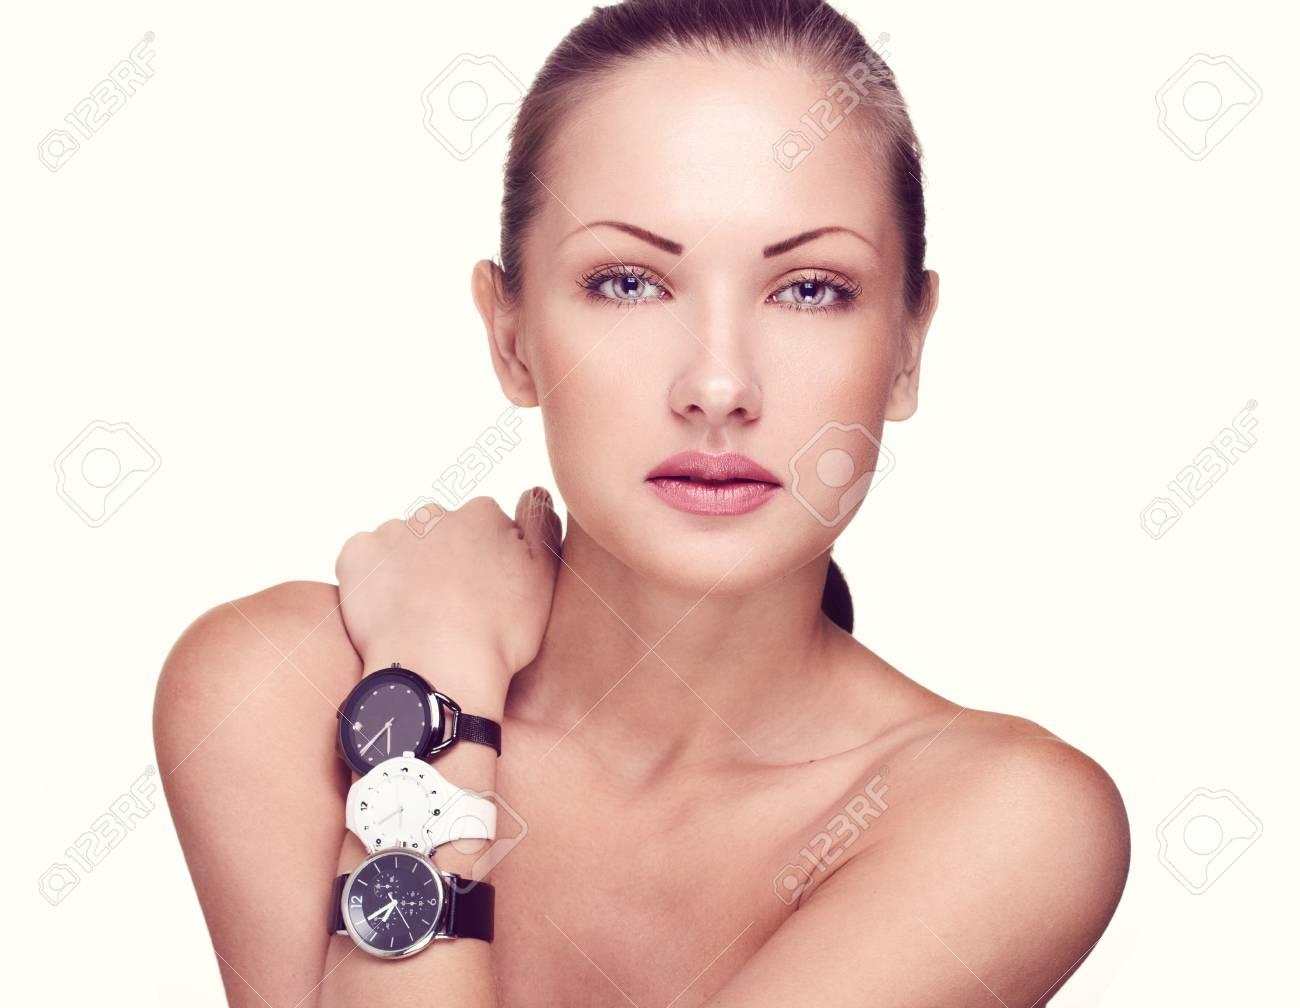 closeup portrait of a beautiful woman with fashion makeup Stock Photo - 15661606